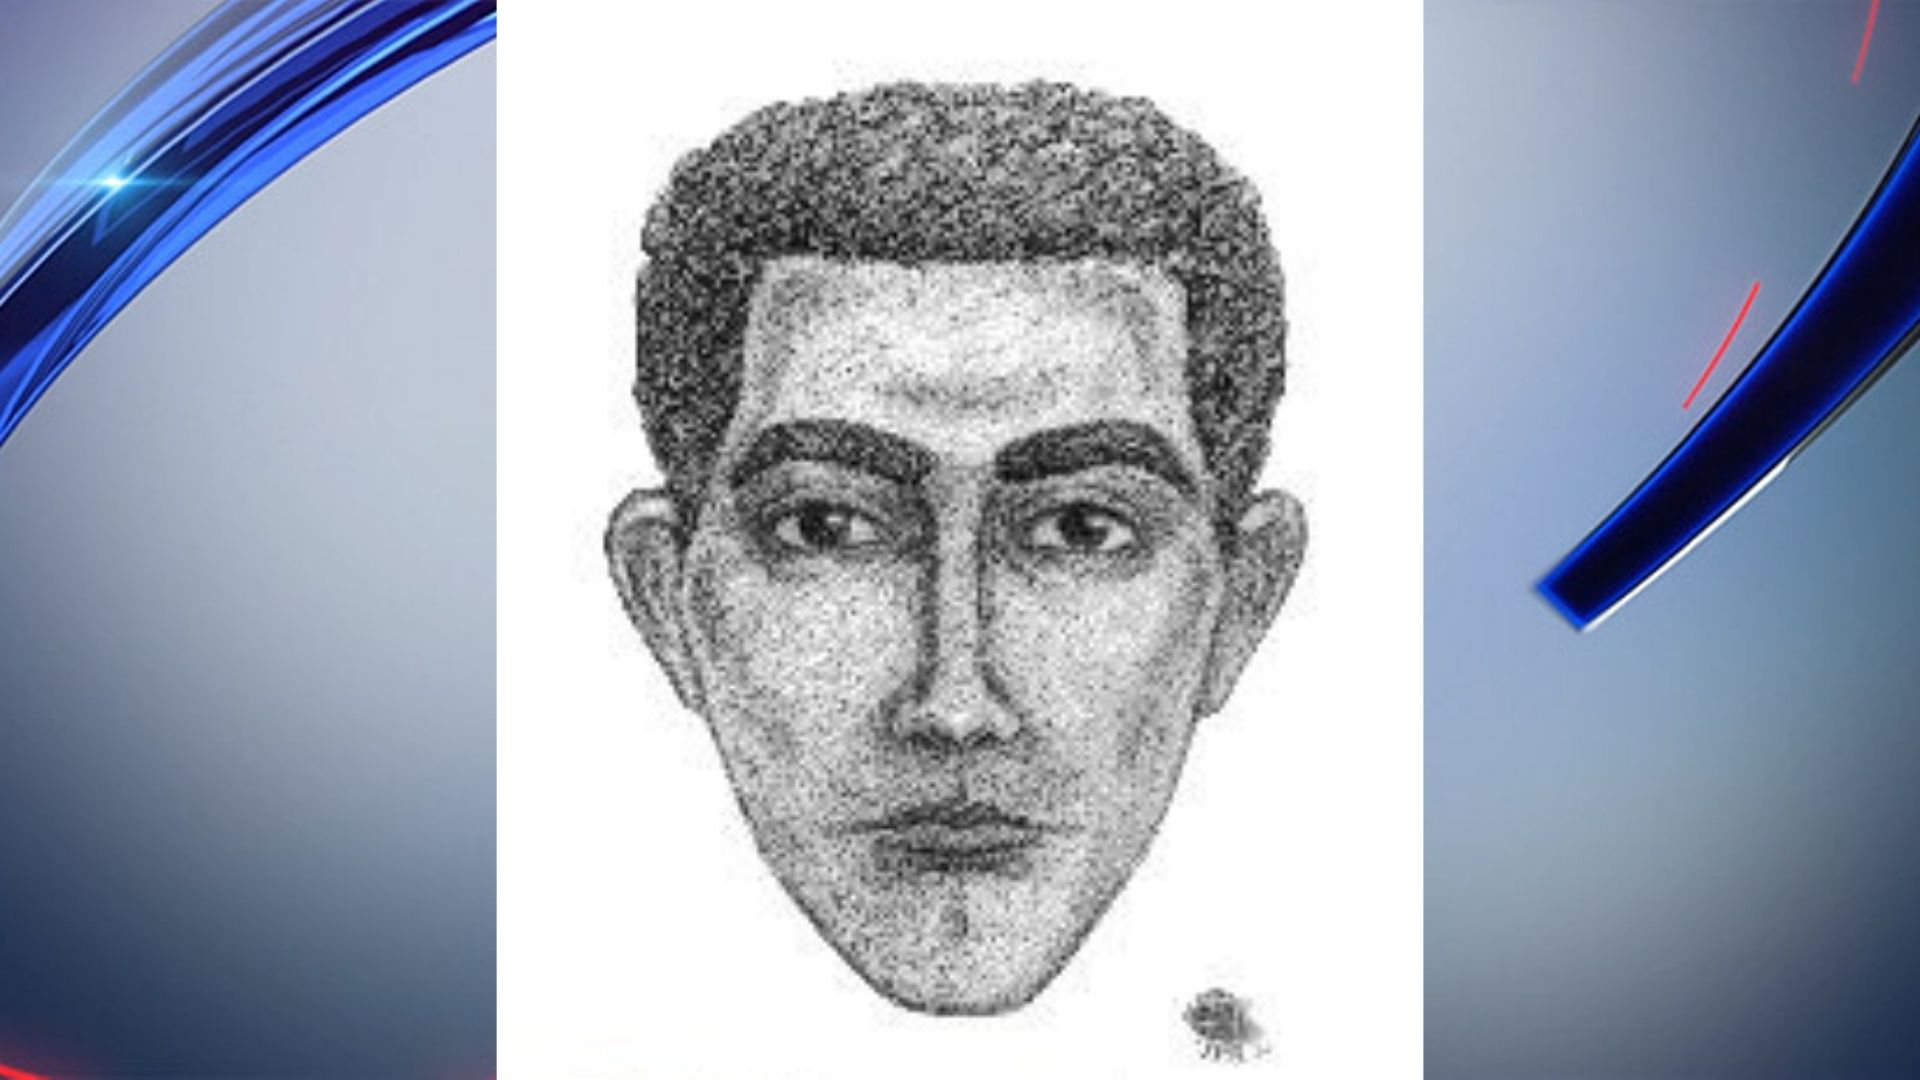 Suspect in subway groping, assault on Upper East Side